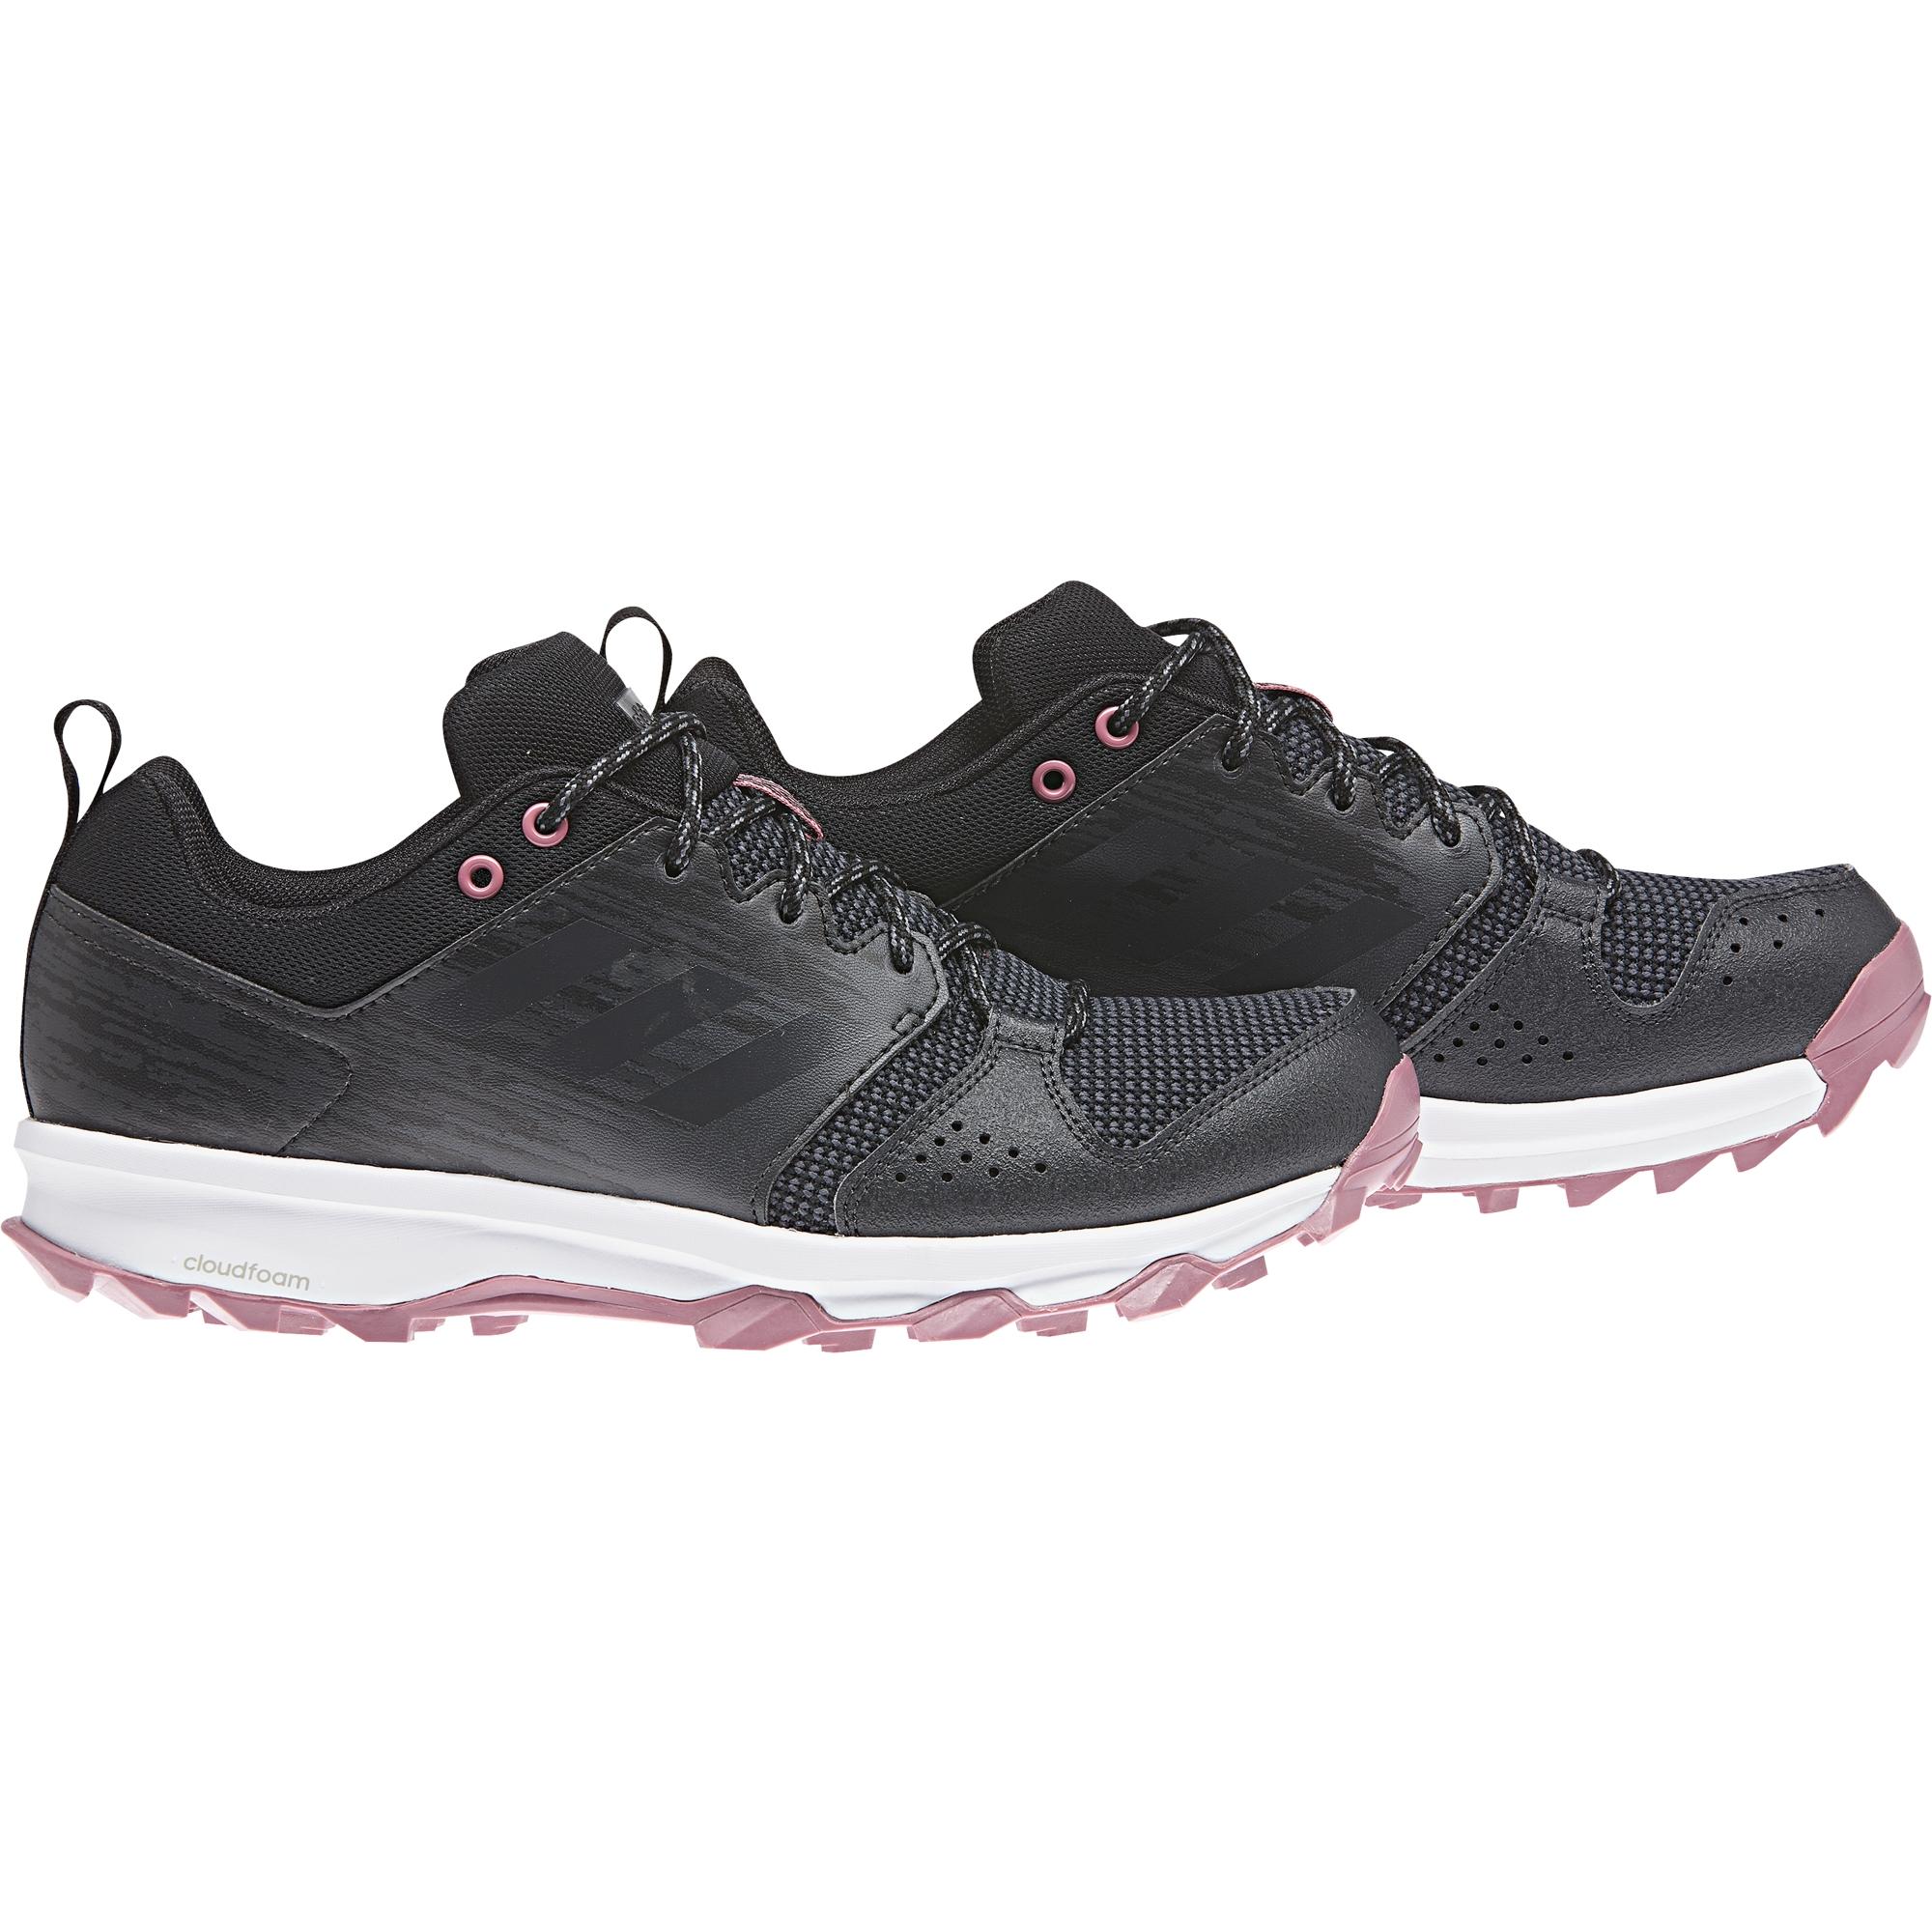 Chaussures femme adidas Galaxy Trail Noir Chaussures et